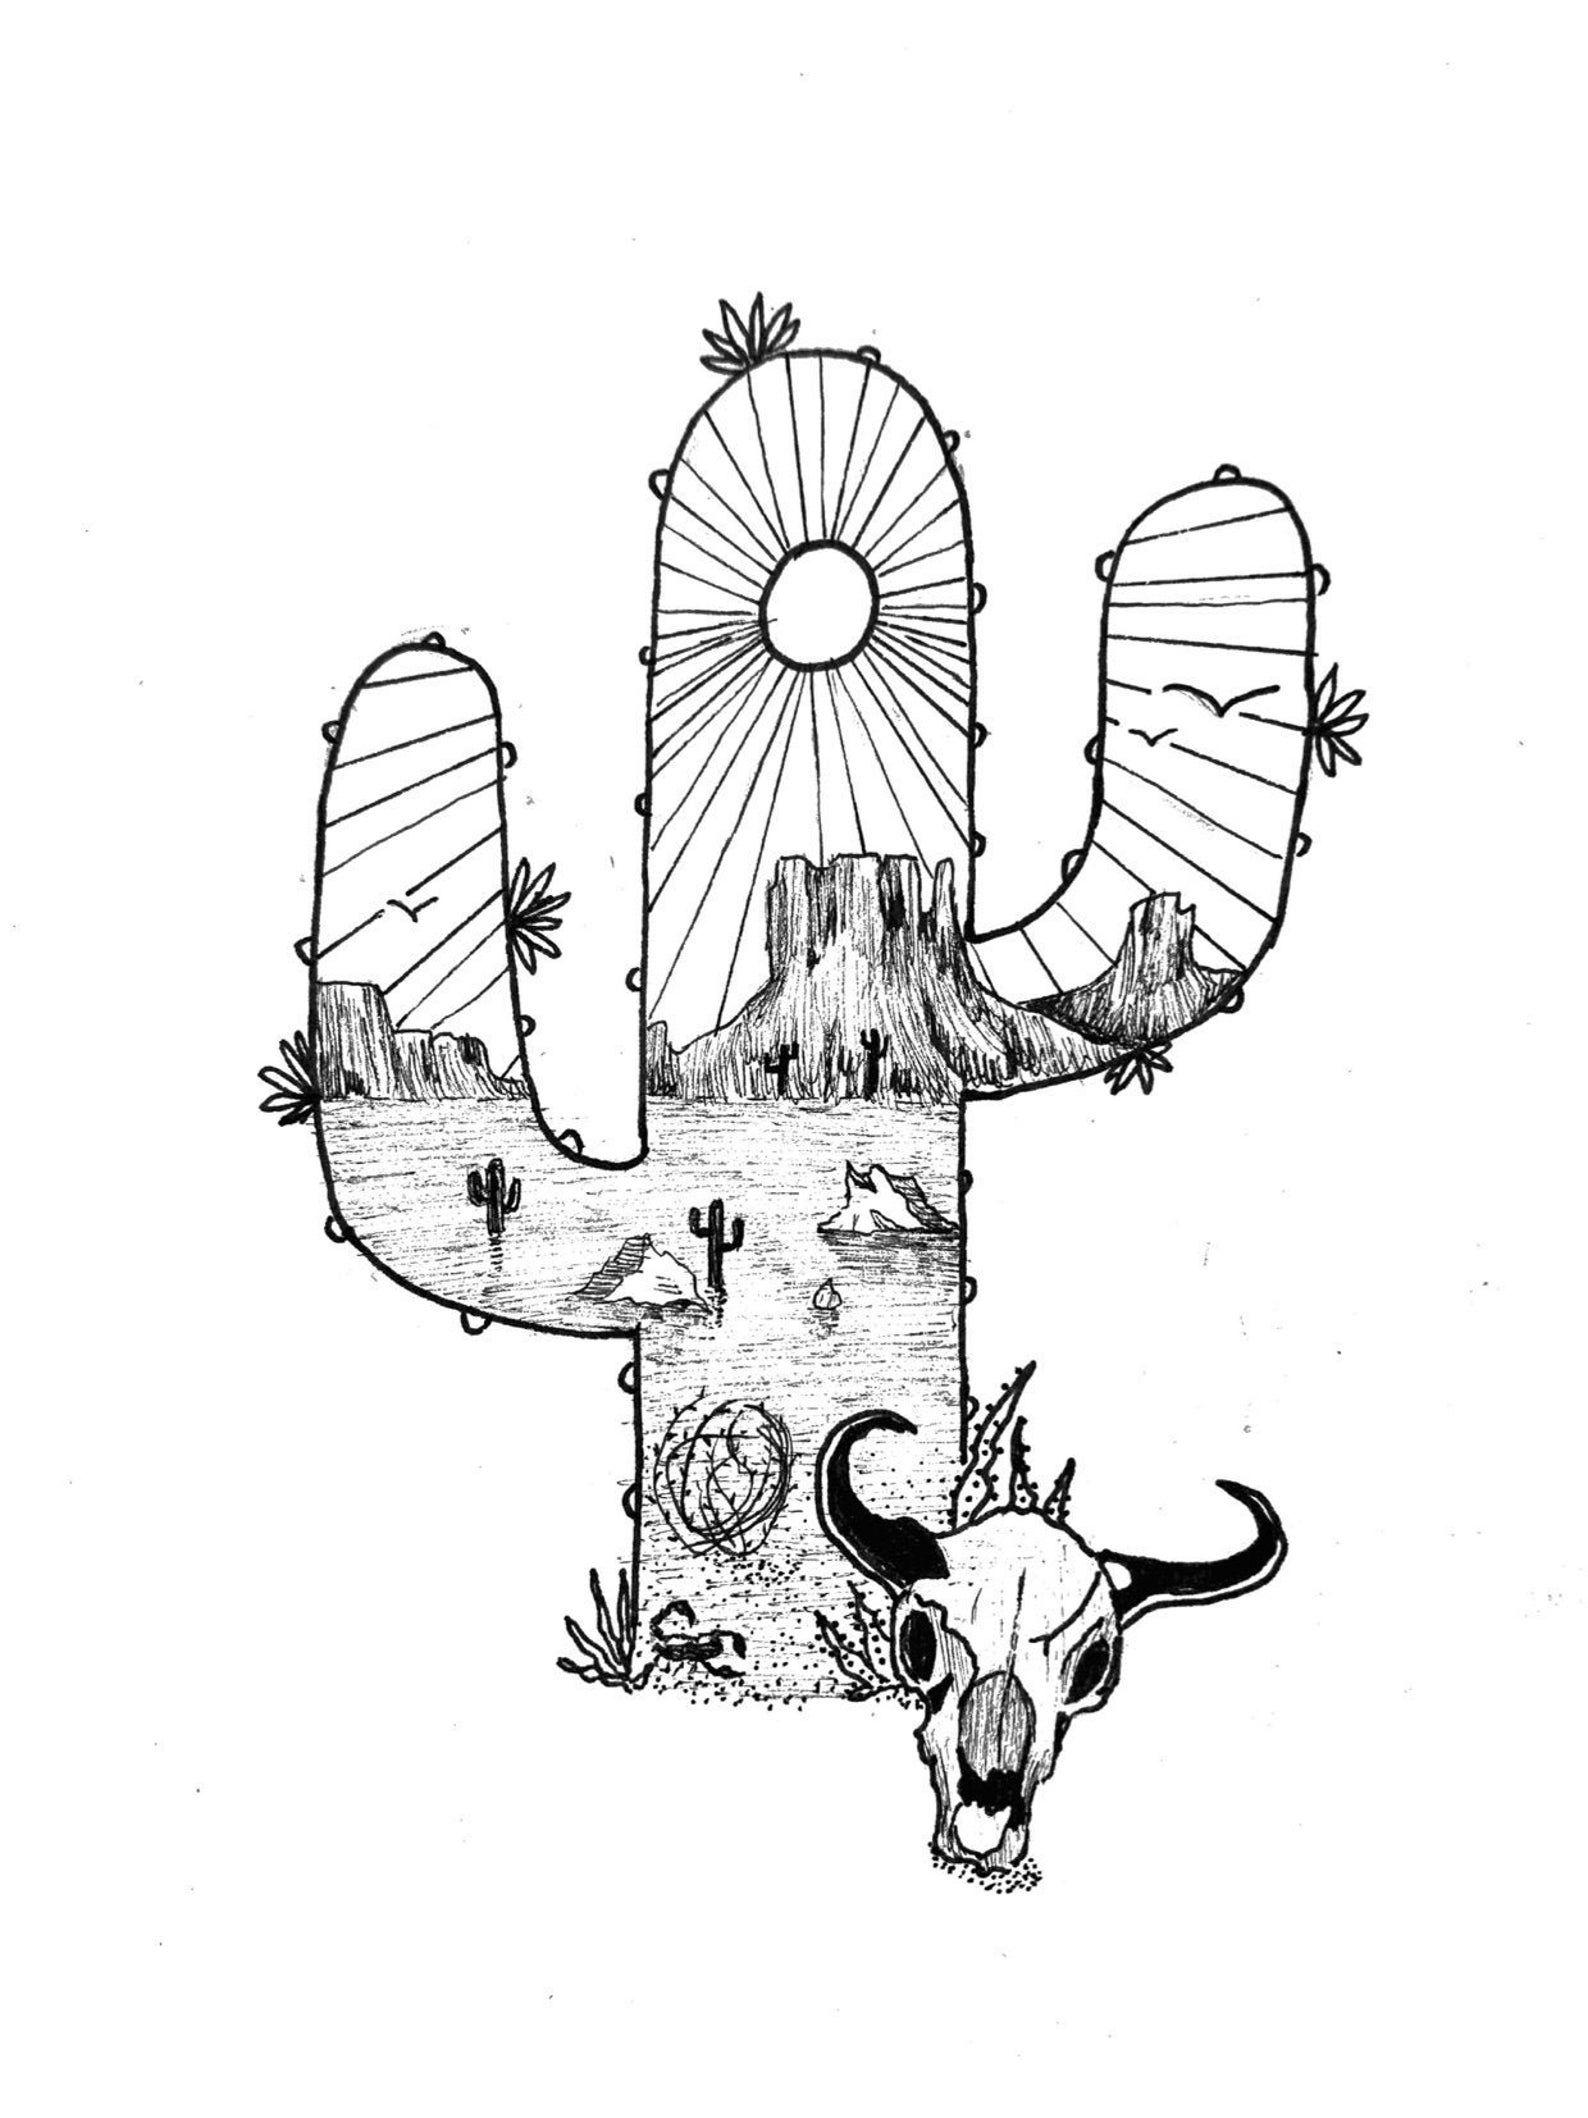 Monument Valley Original Ink Artwork